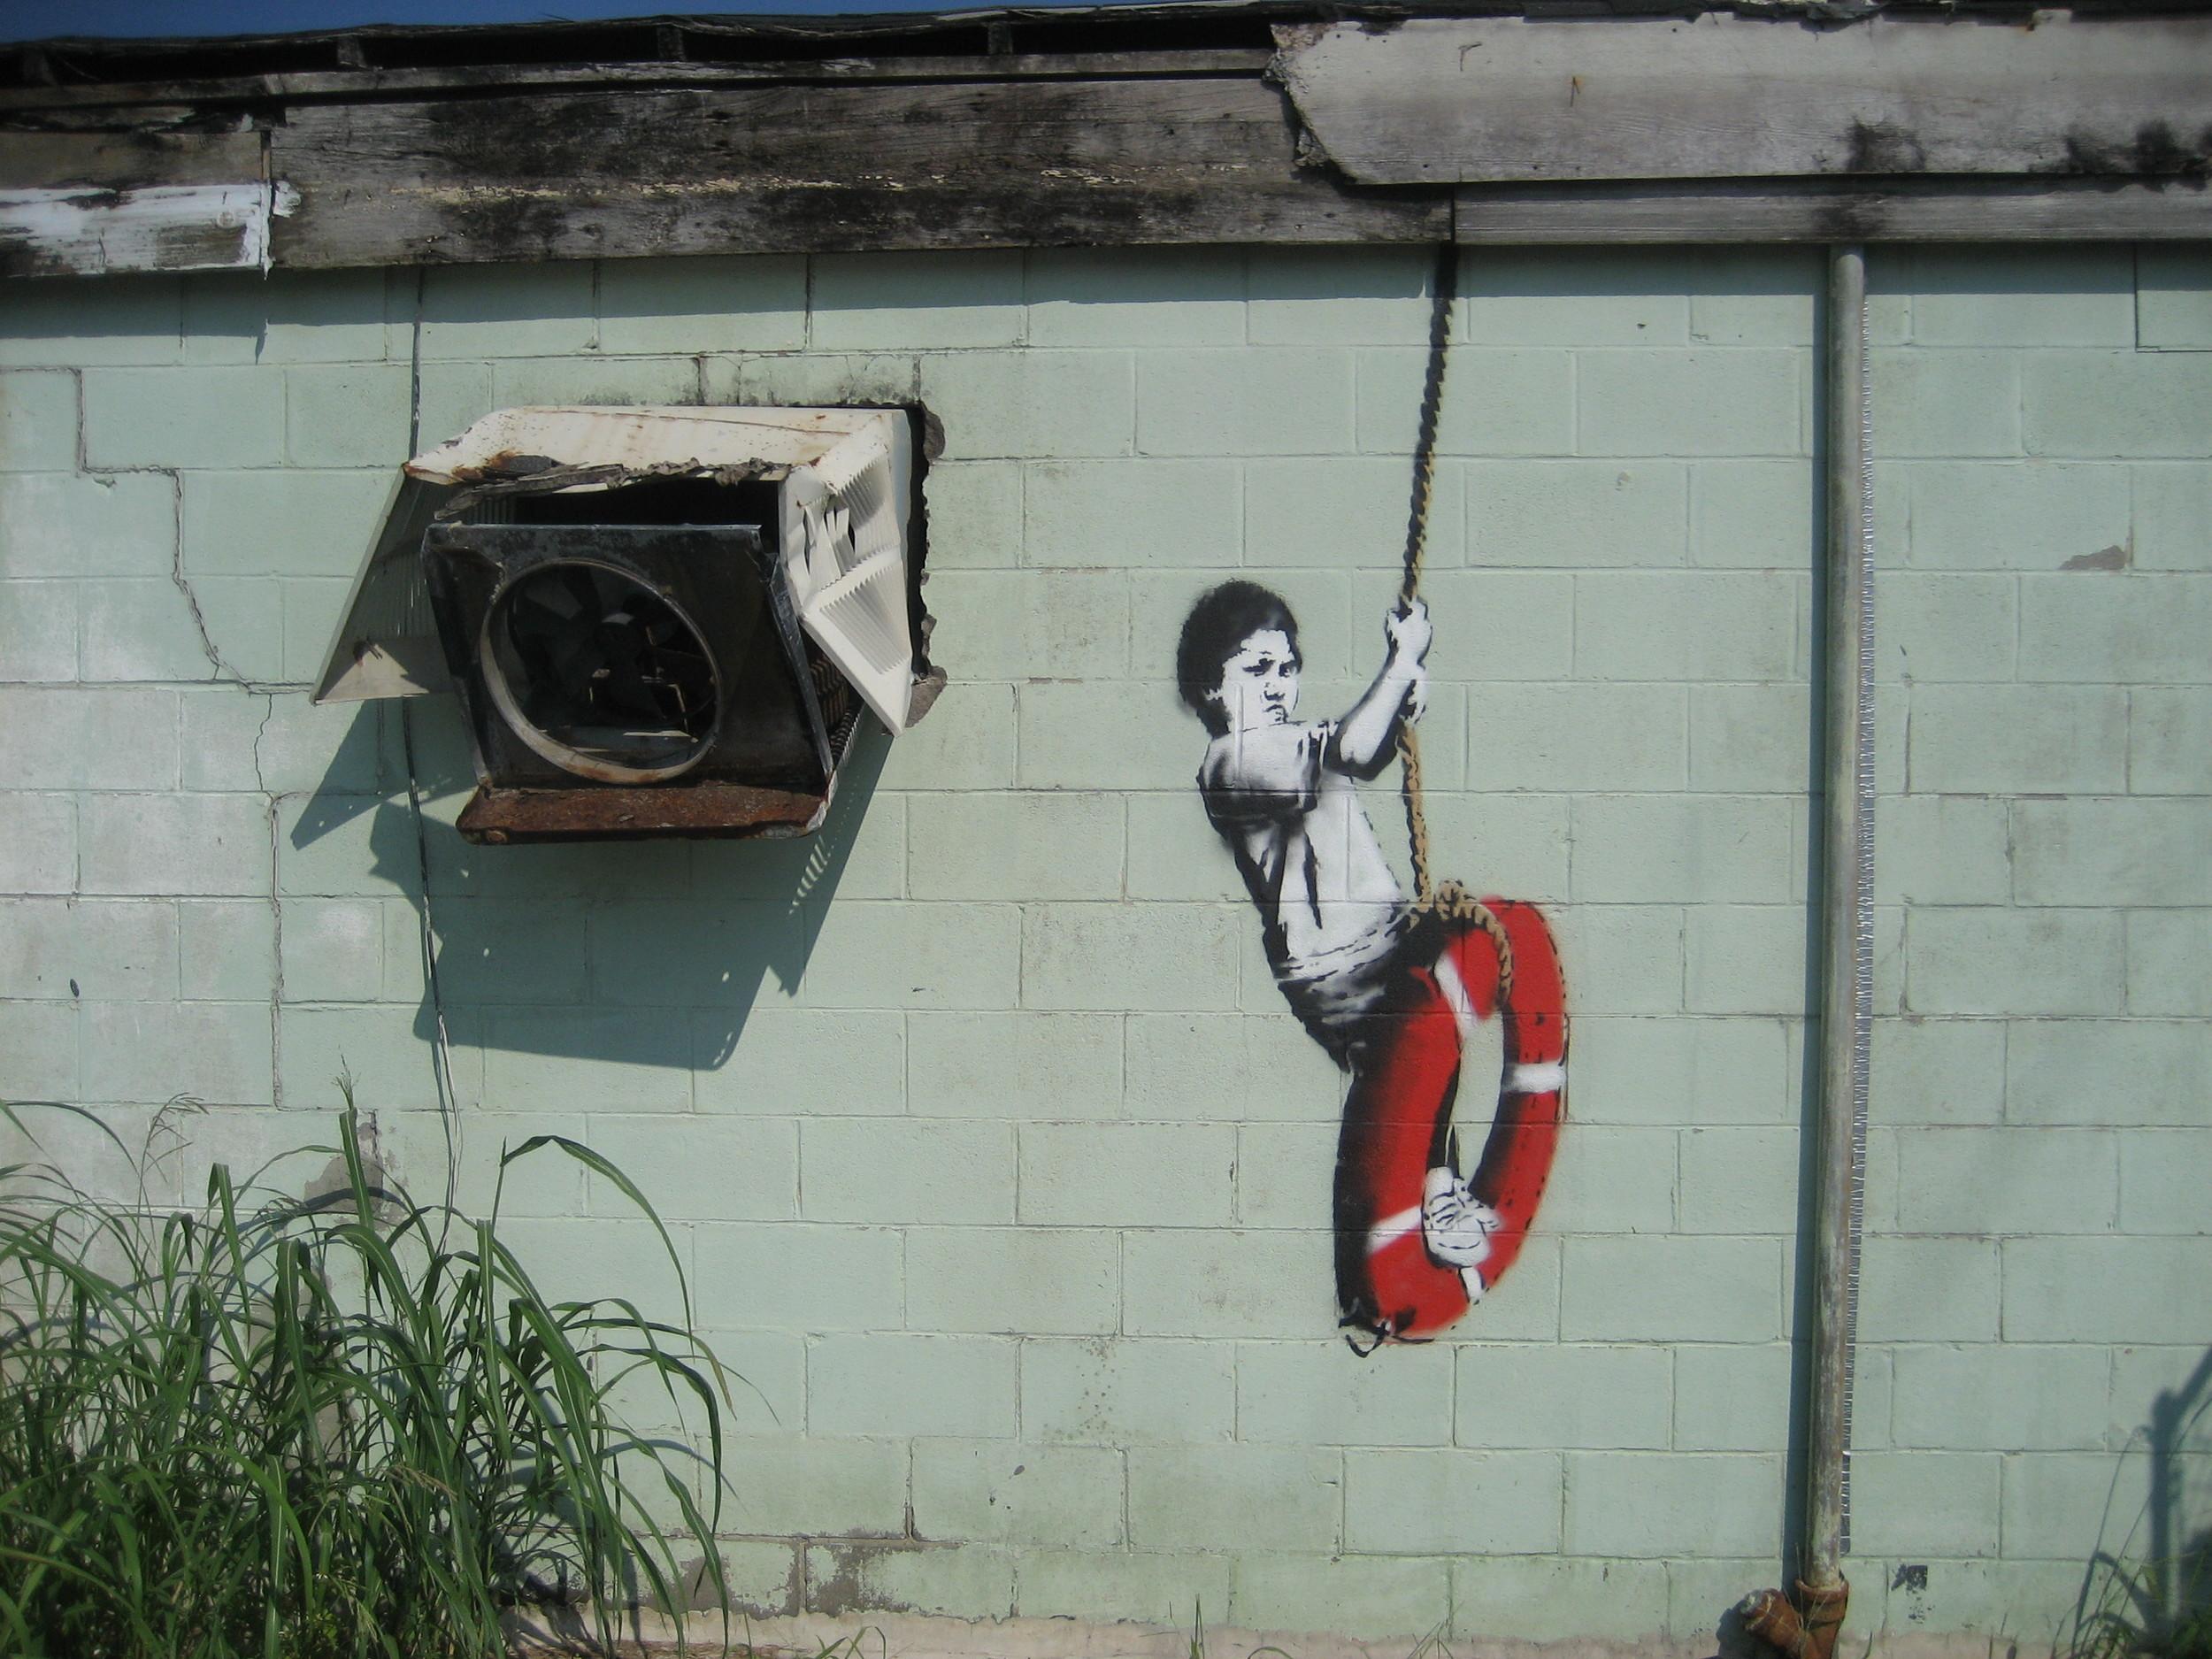 Banksy_Swinger_Building_Detail.jpg